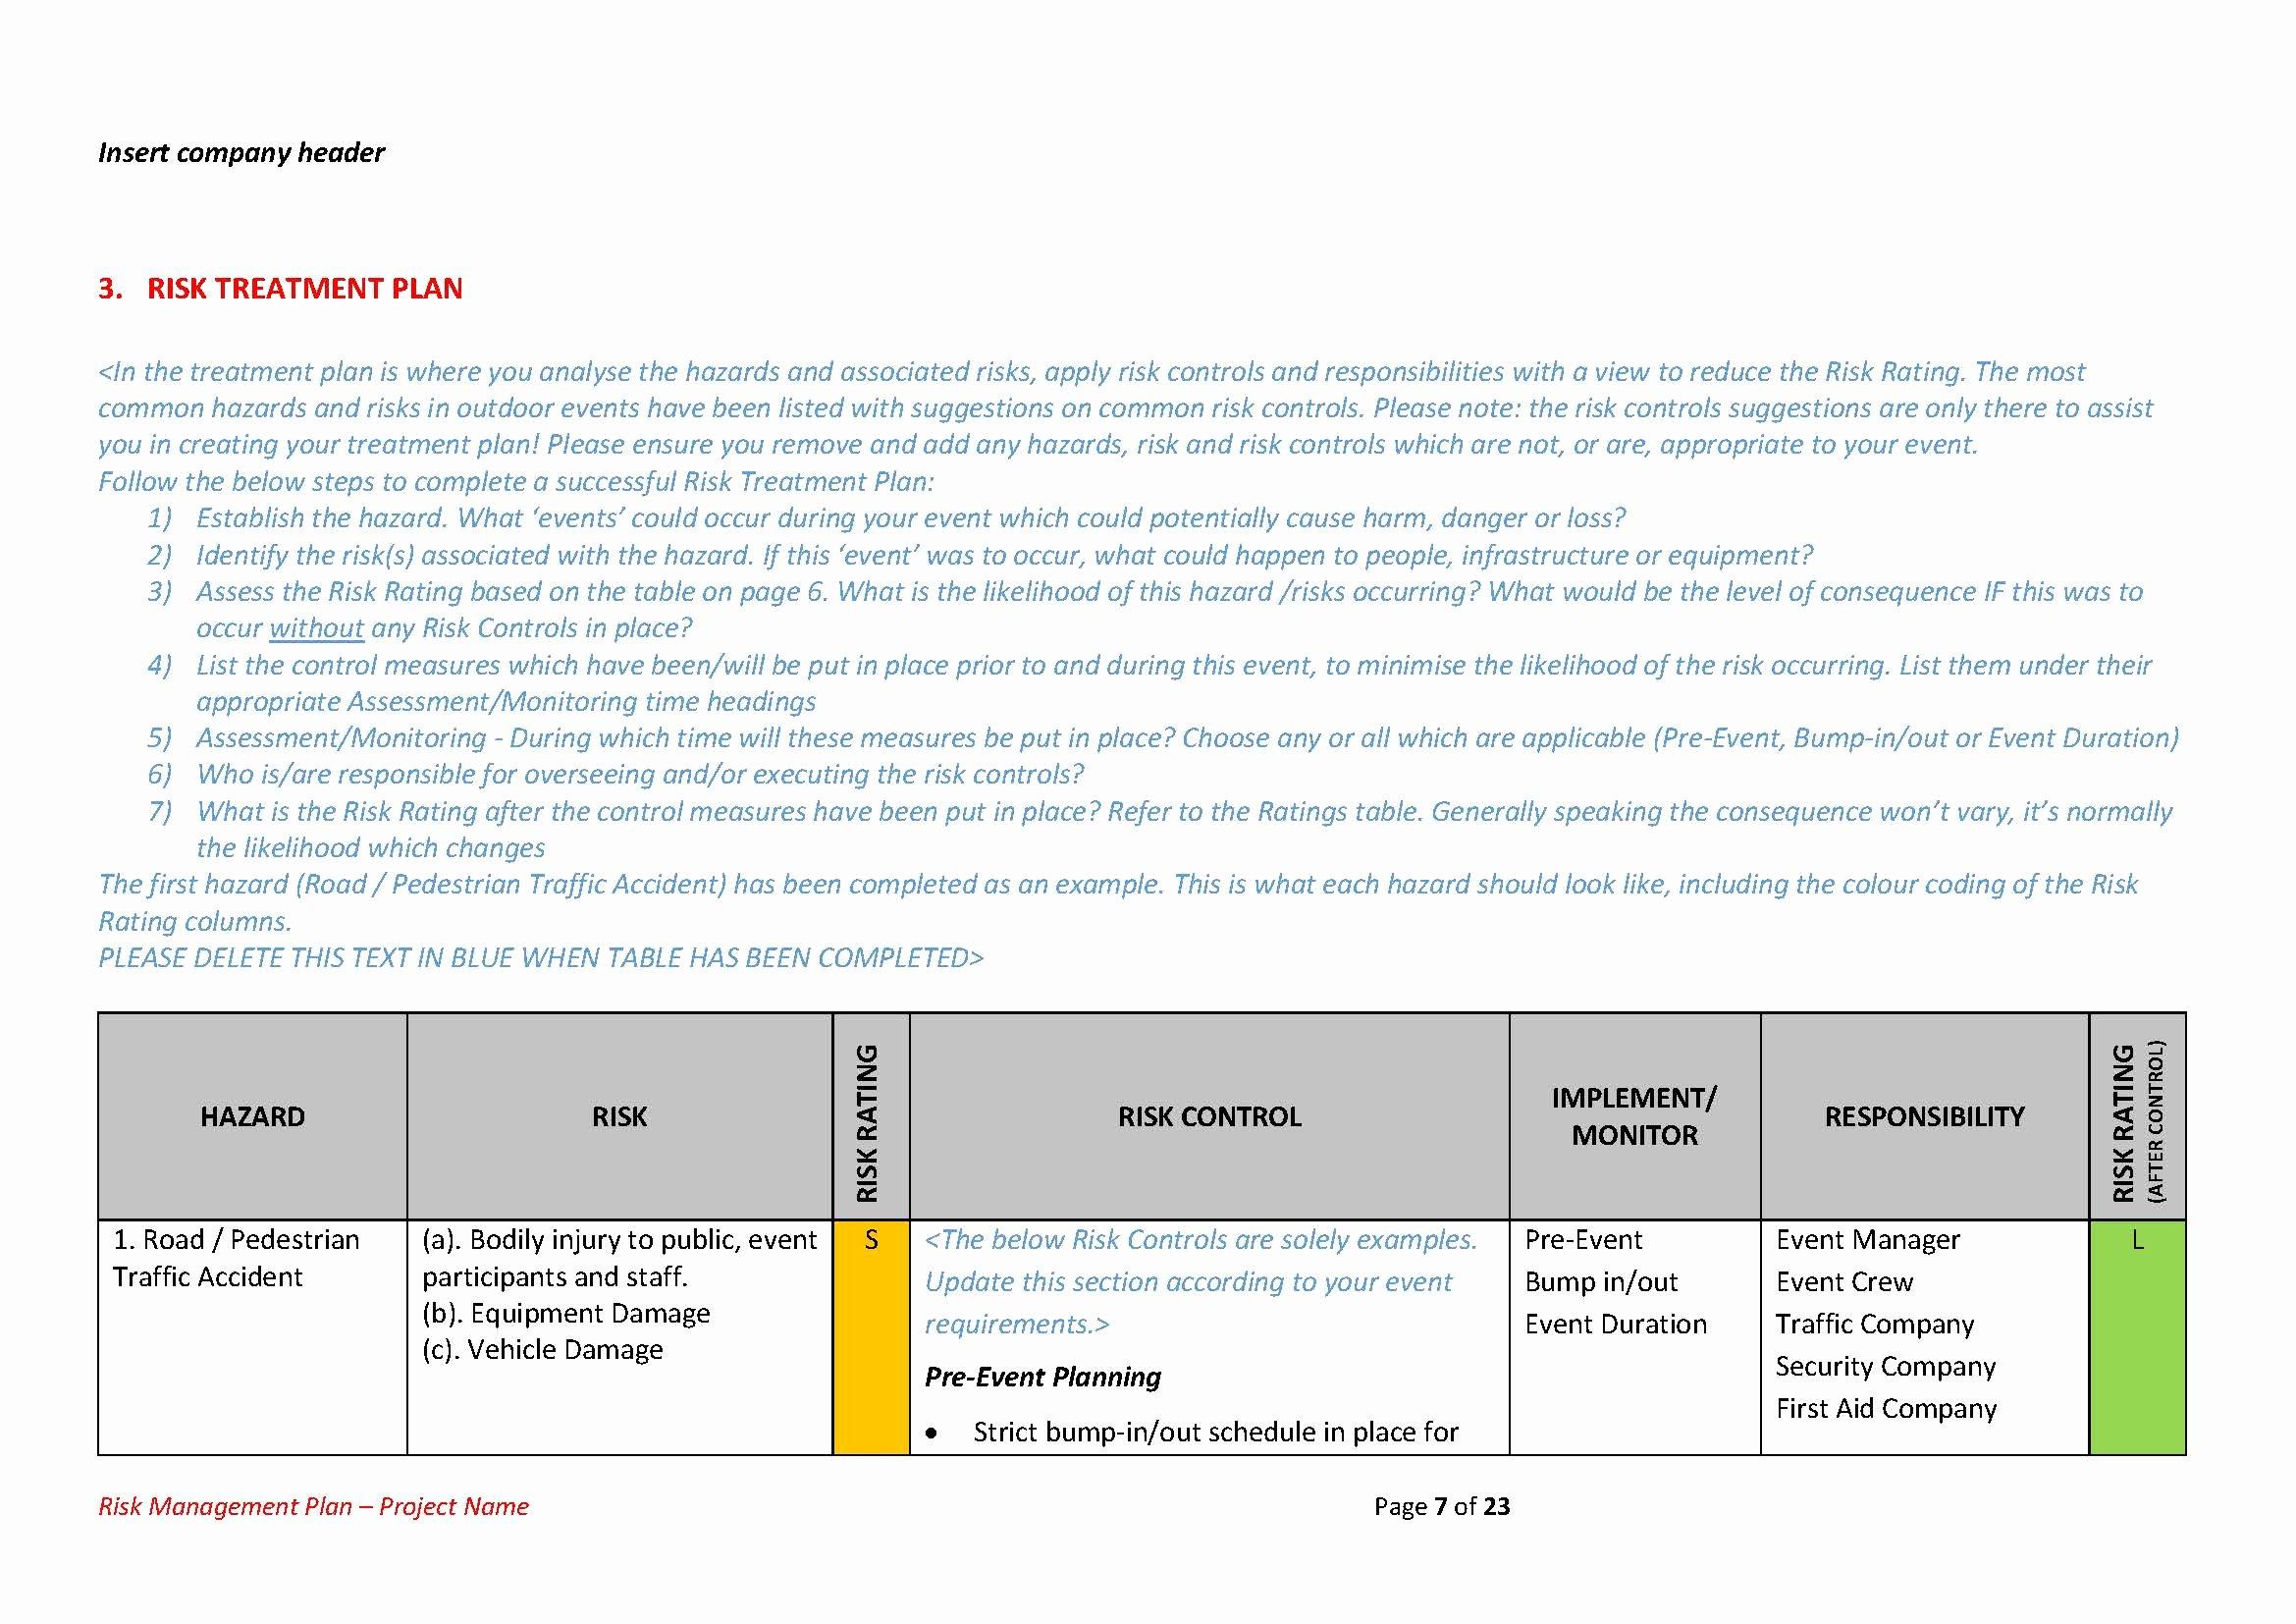 Risk Management Plan Template Doc Luxury Risk Management Plan Template Easy to Use